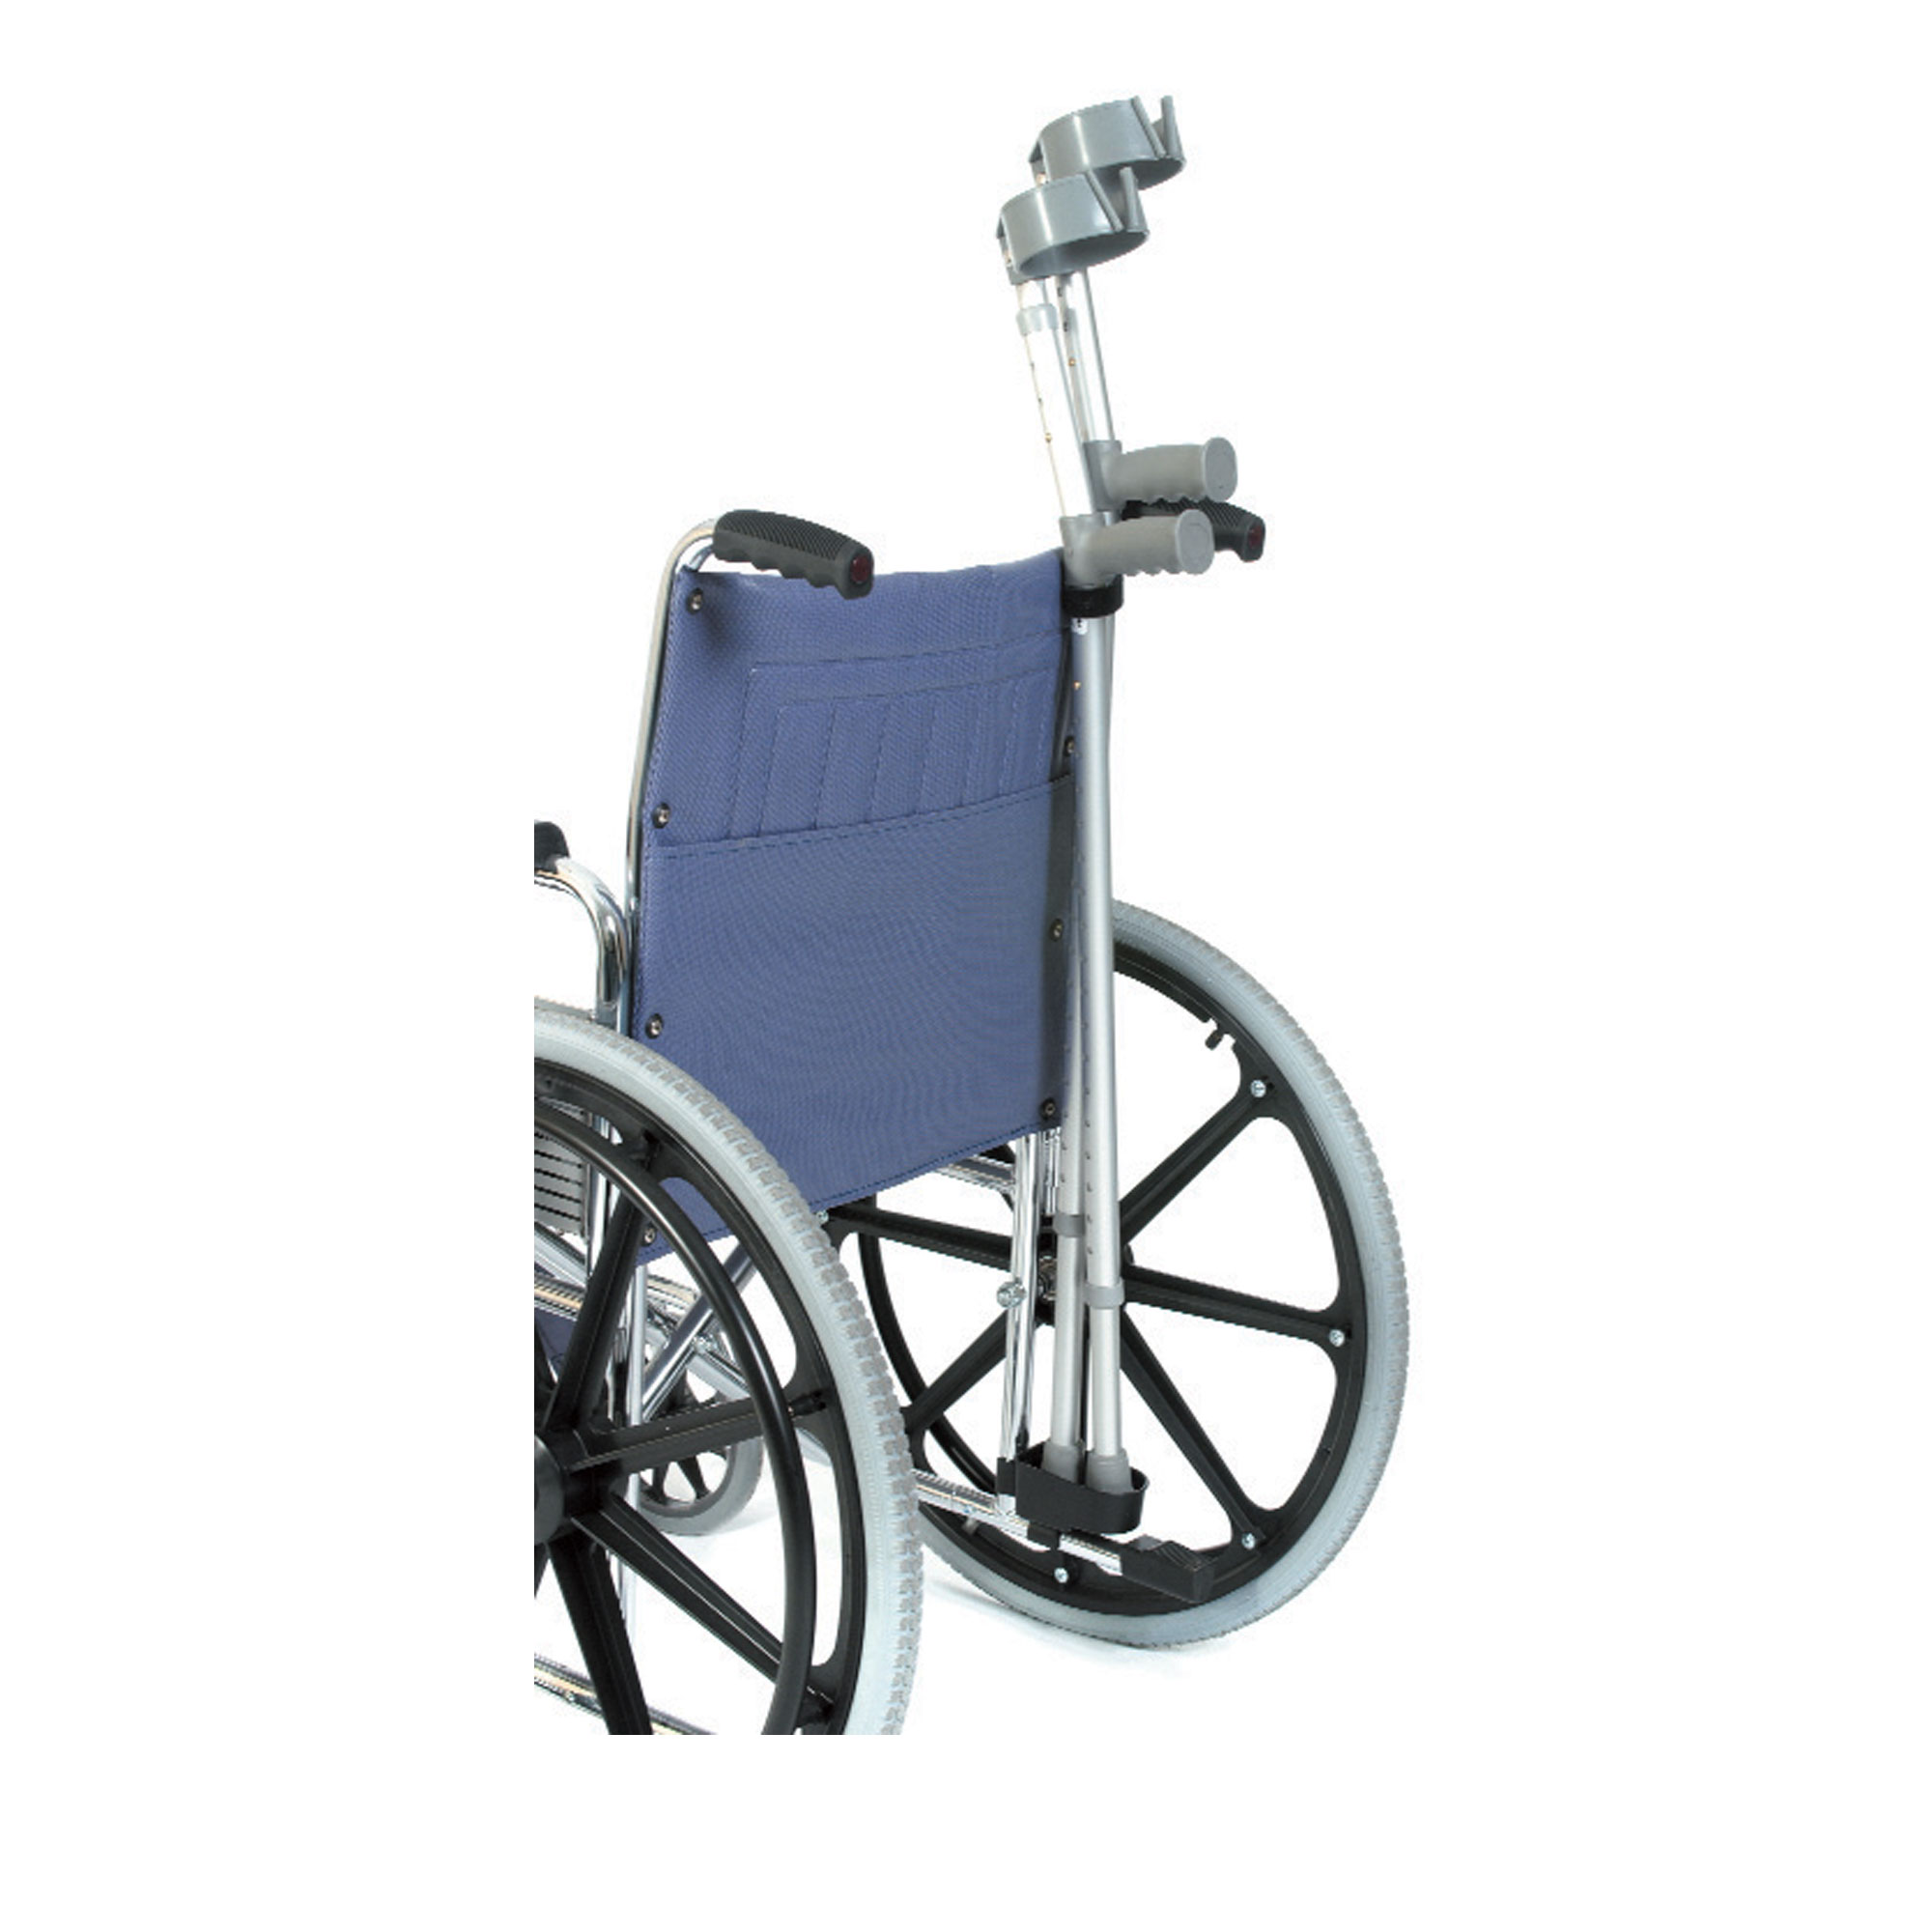 Ac120 Crutch Amp Walking Stick Holder Standard Chair